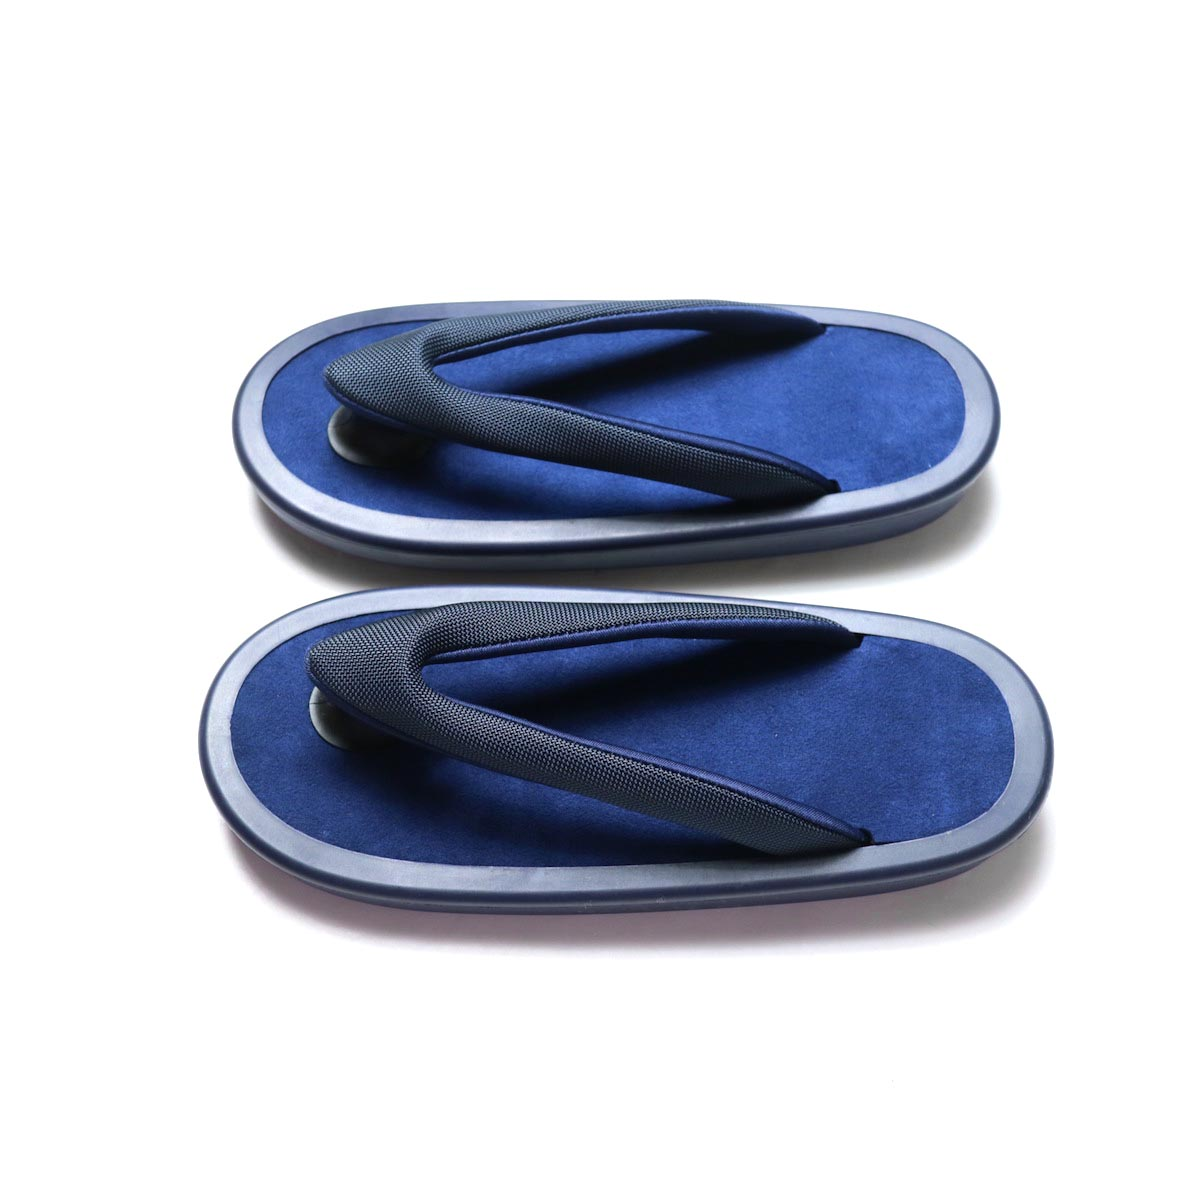 JOJO / Beach Sandal -Black (細鼻緒 / Navy Suede)サイド